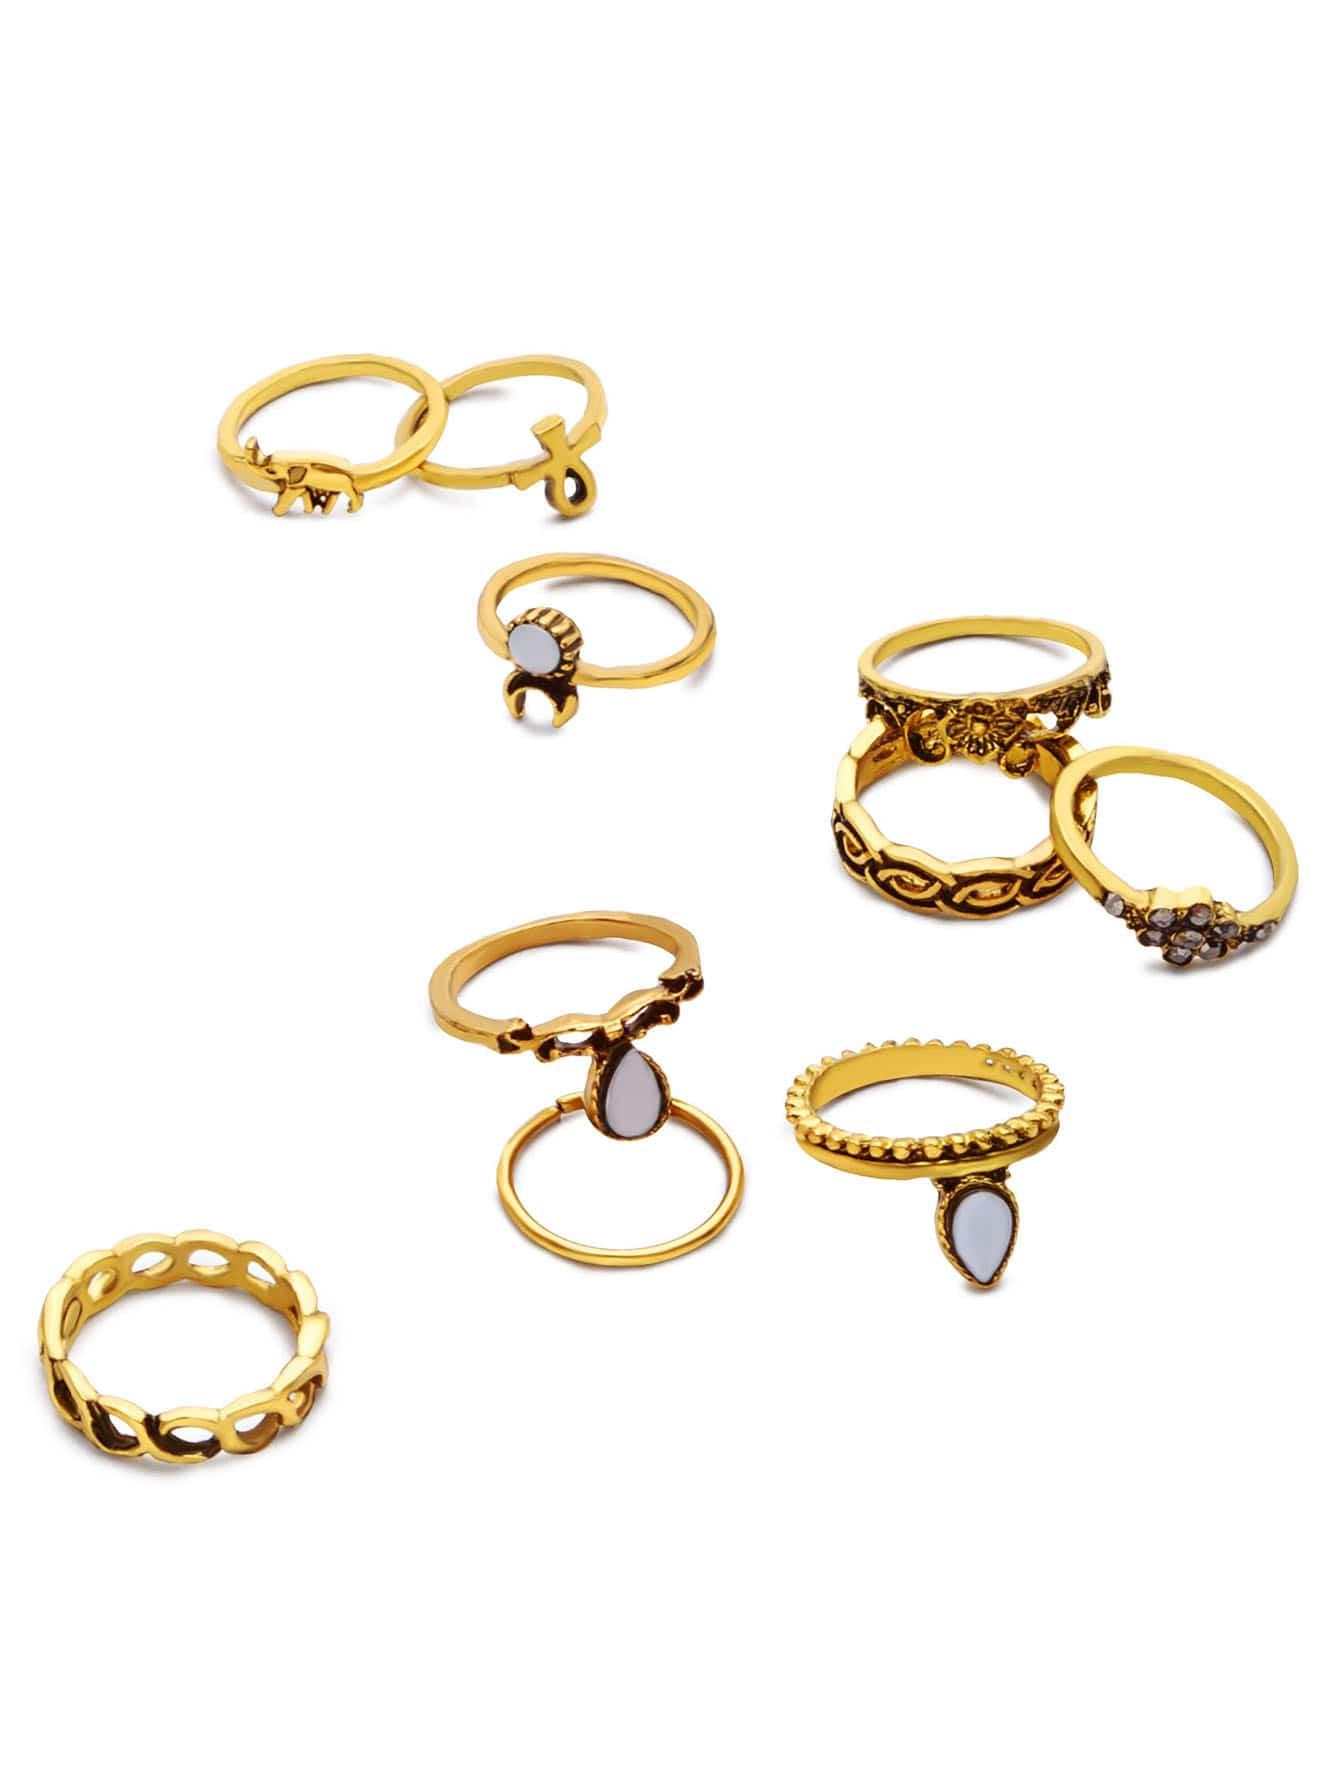 Фото 10PCS Antique Gold Geometric Carved Ring Set. Купить с доставкой